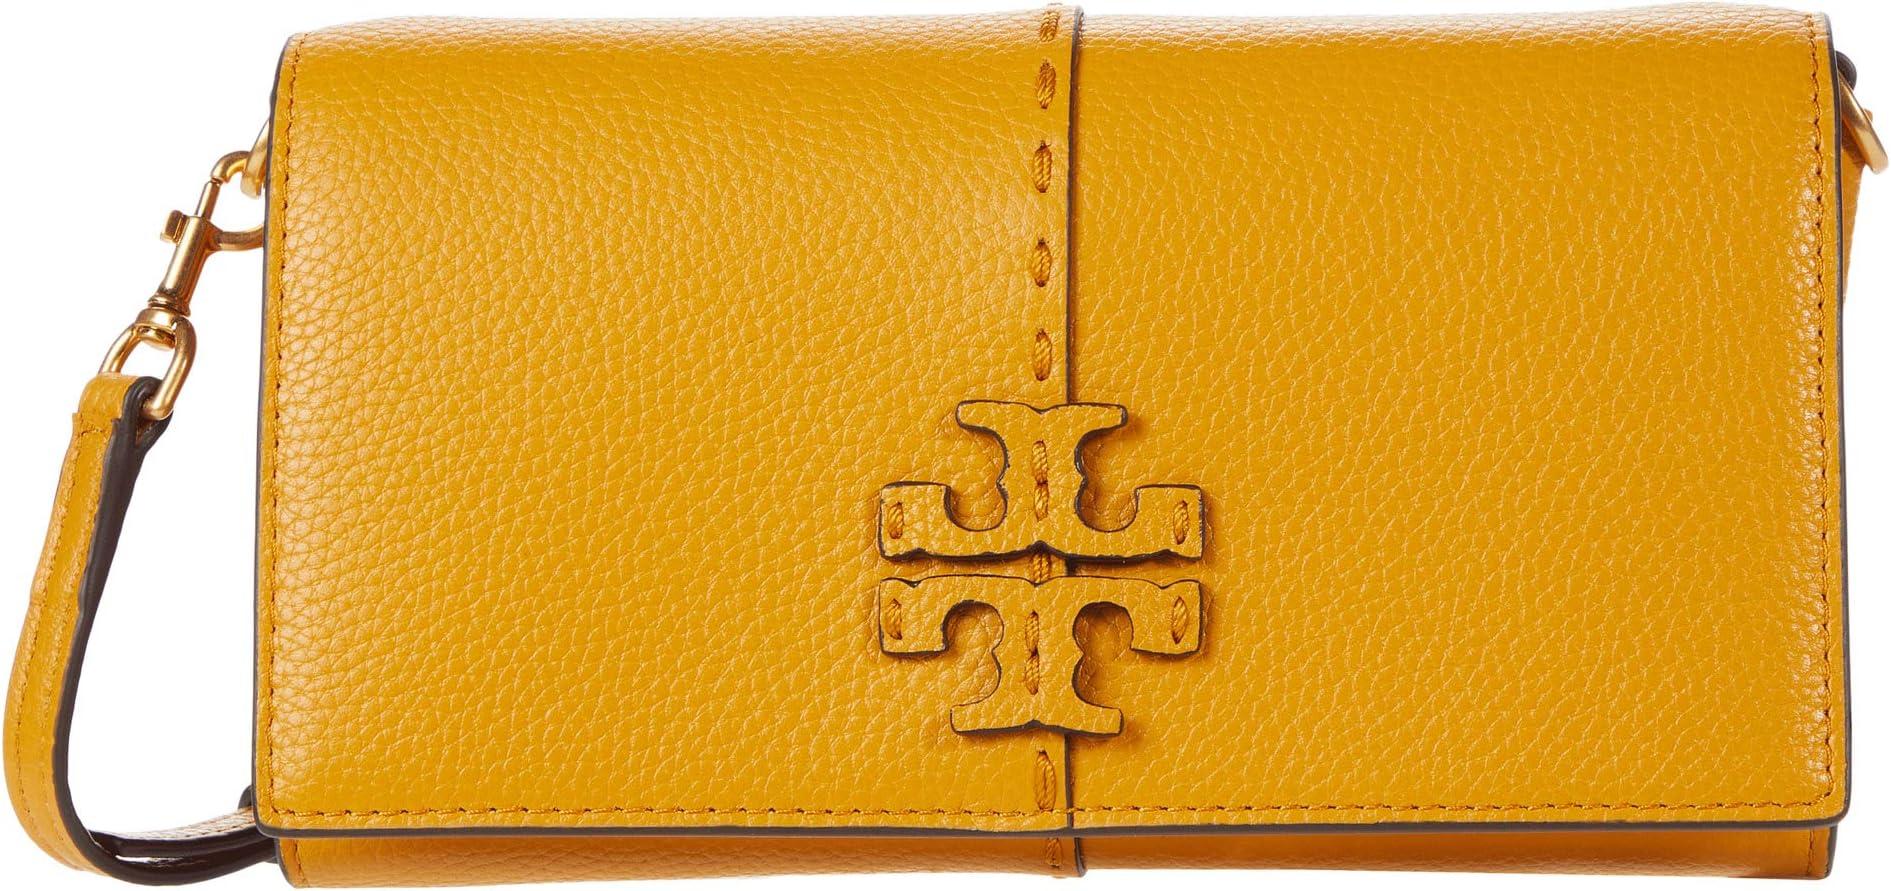 Tory Burch McGraw Wallet Crossbody